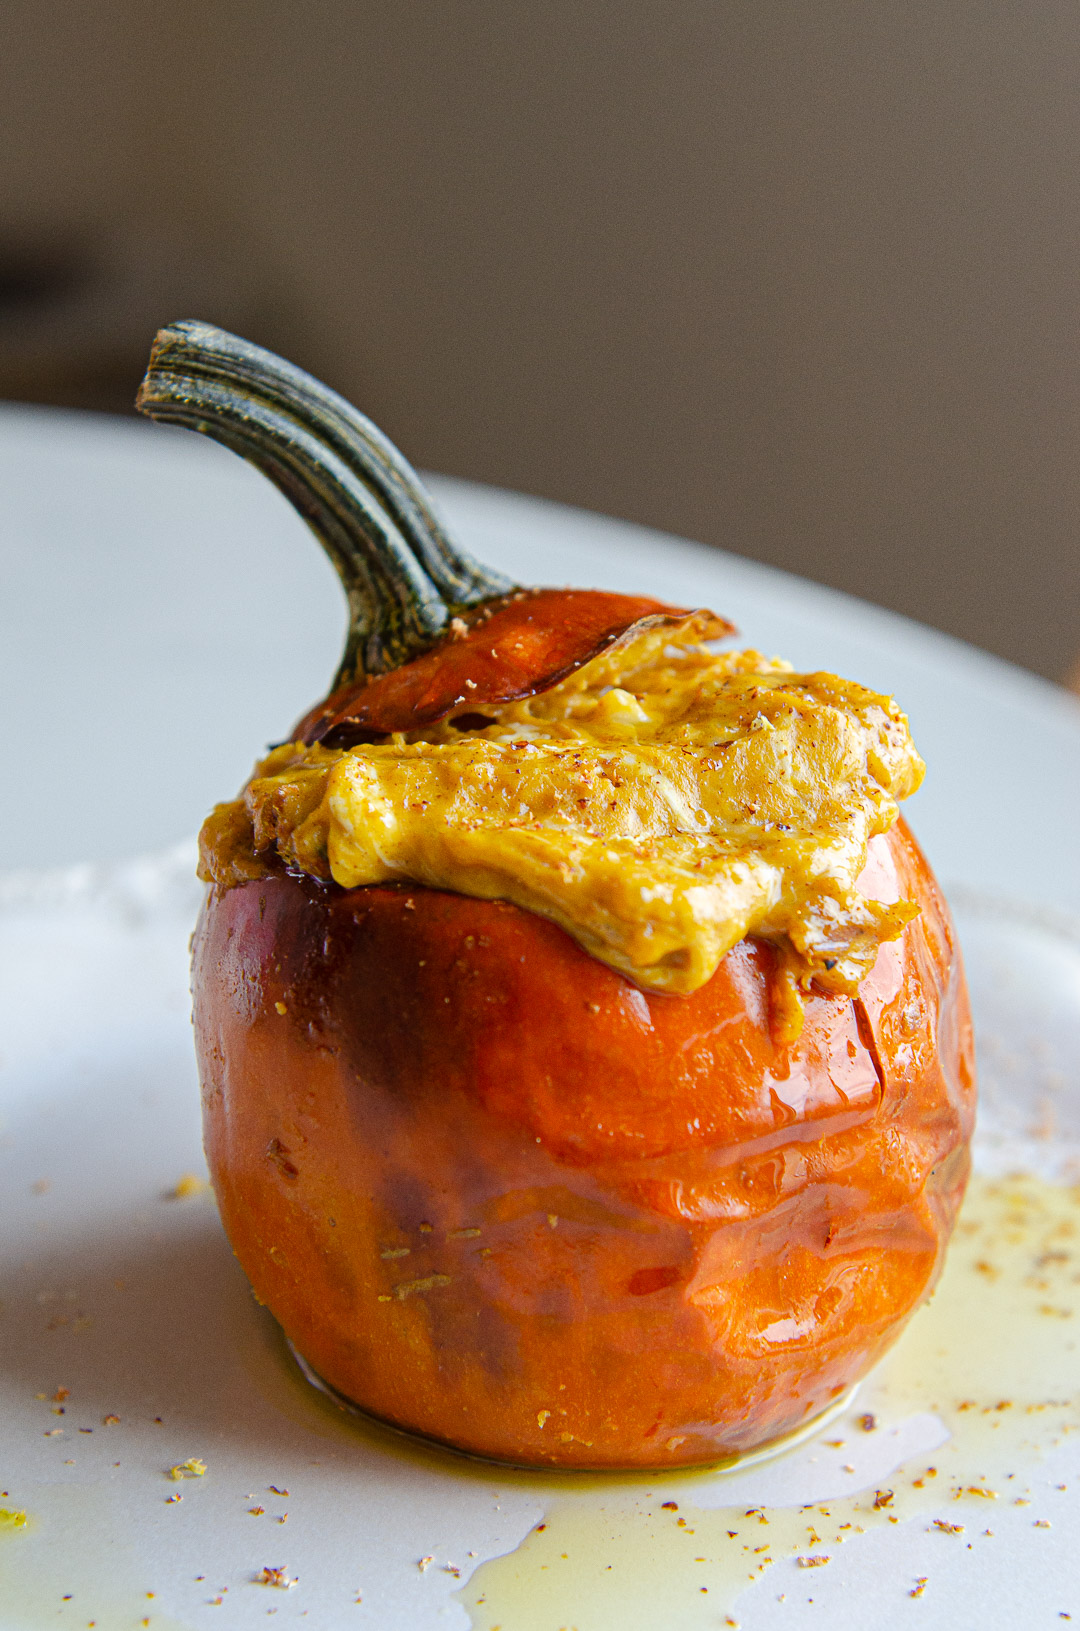 DiAnoia's Eatery Gnocchi Pumpkin Bowl